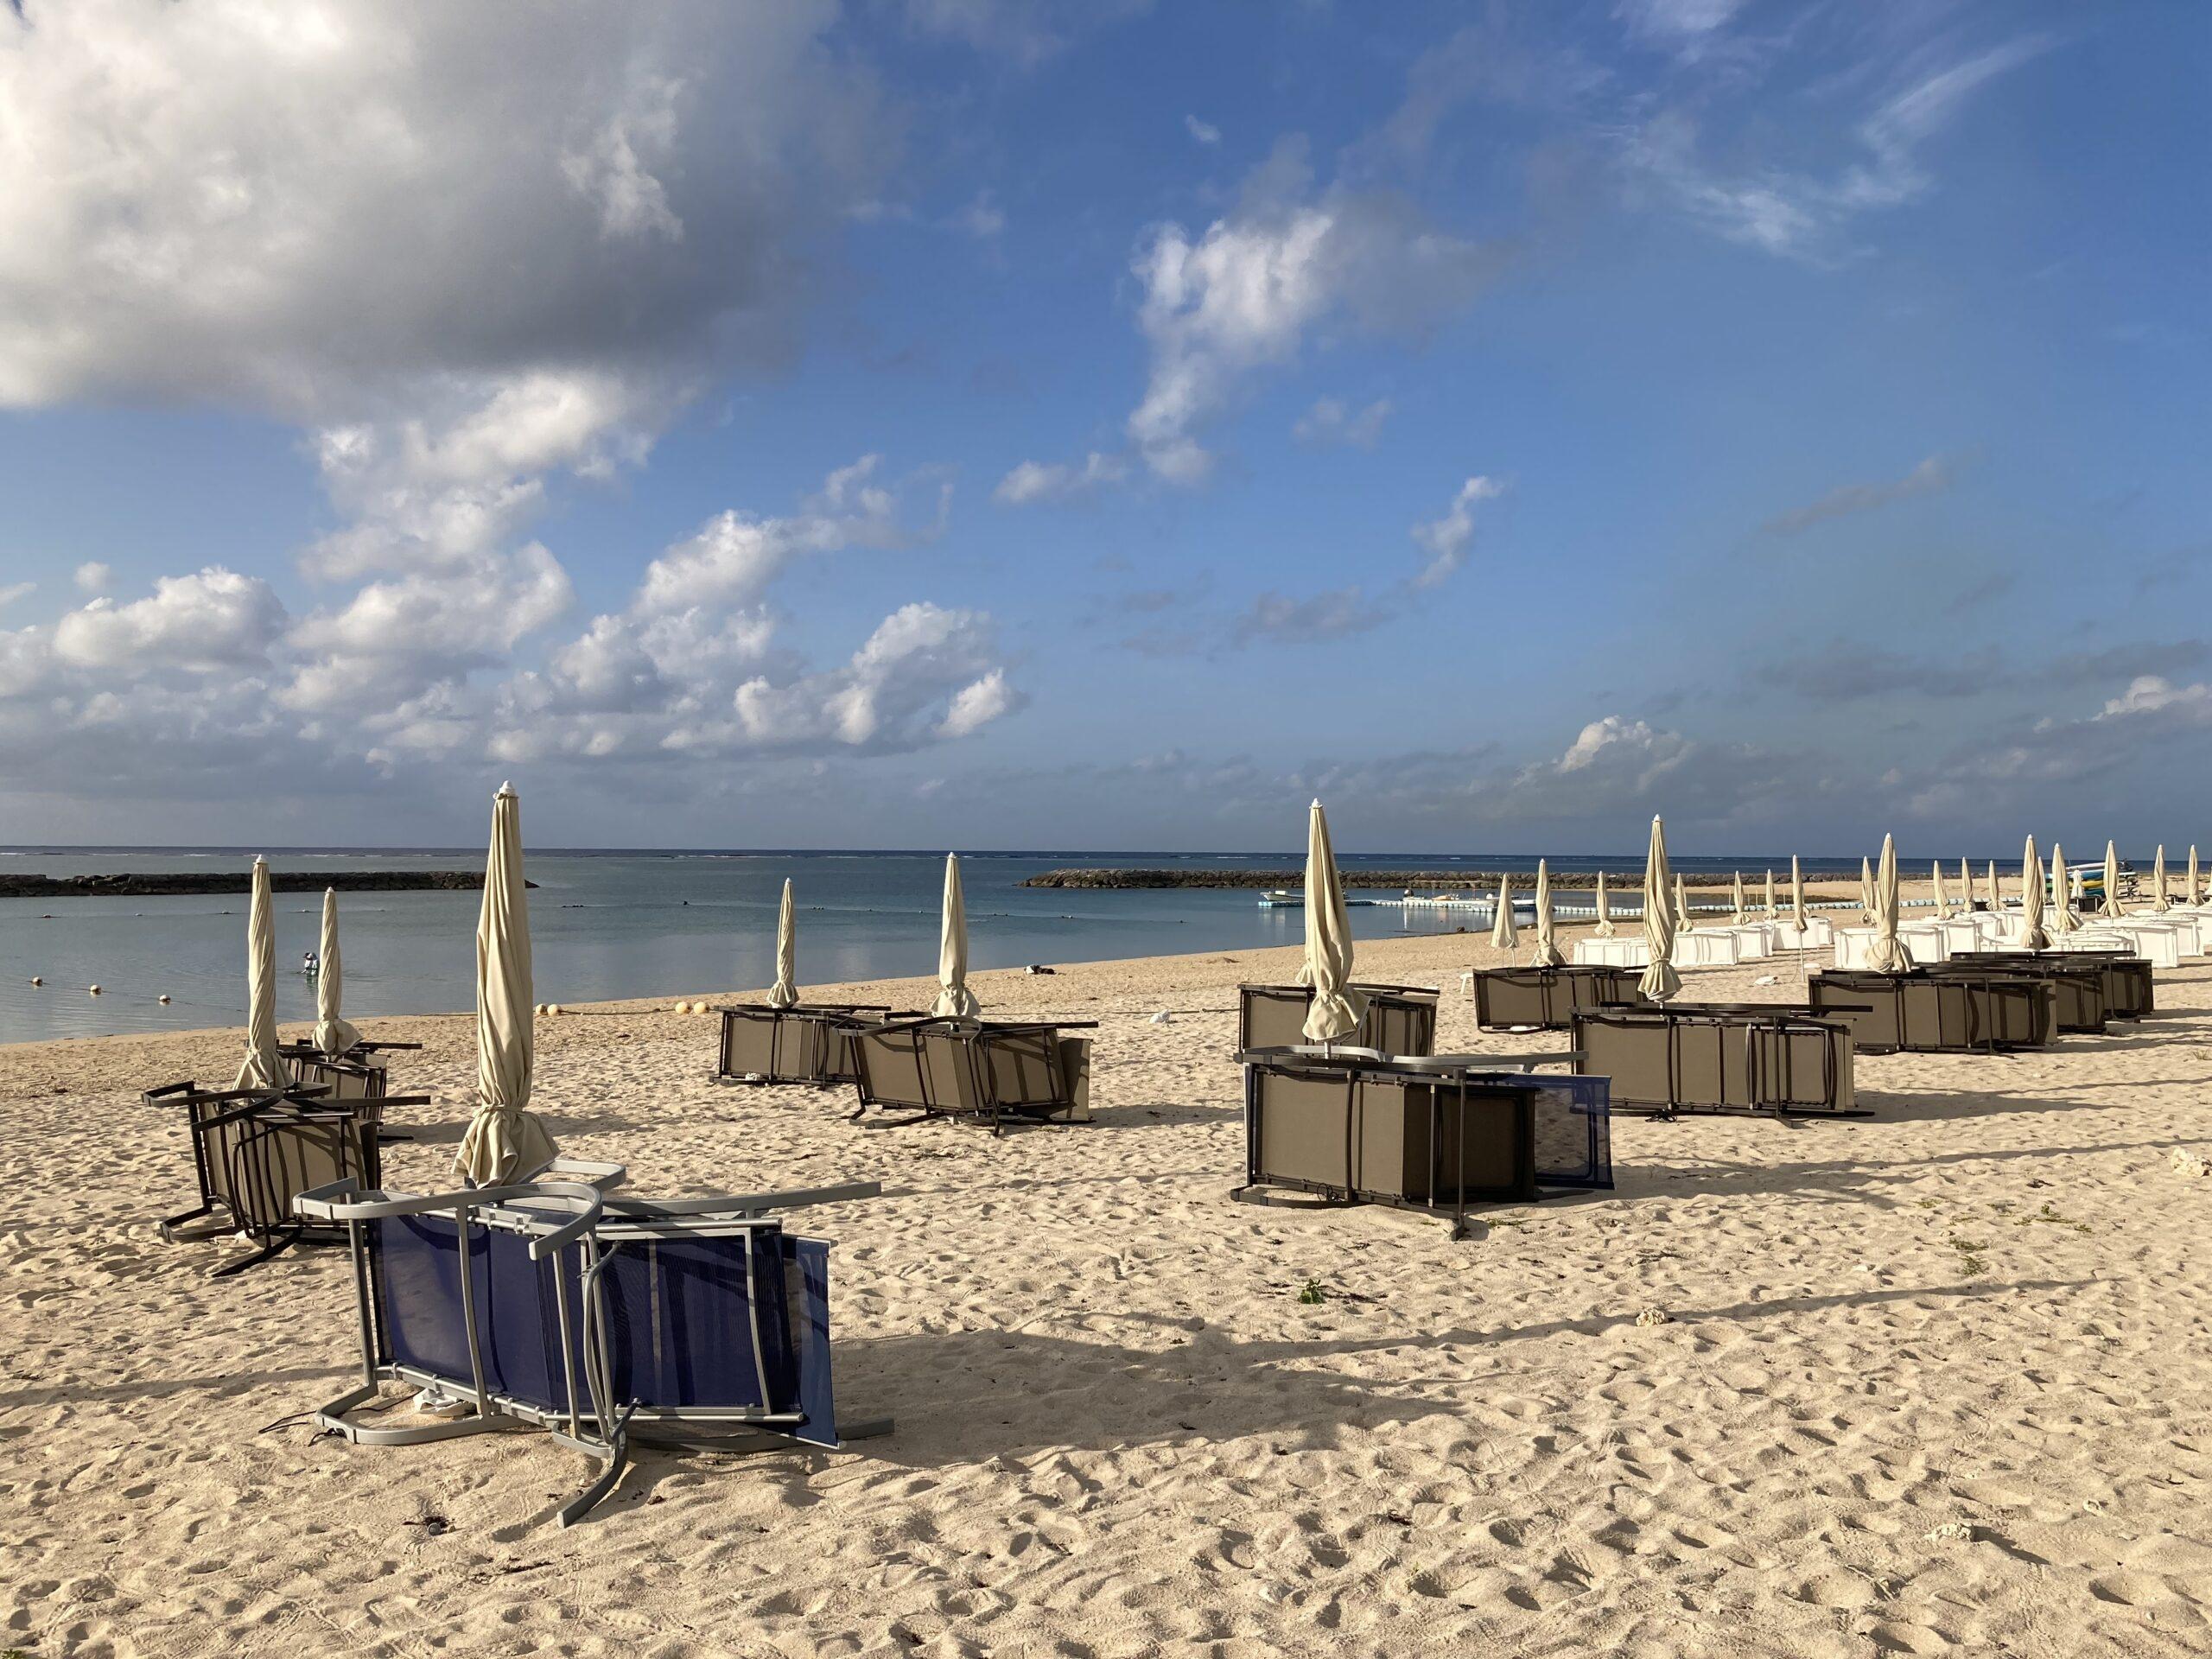 ANAインターコンチネンタルリゾート石垣島の写真